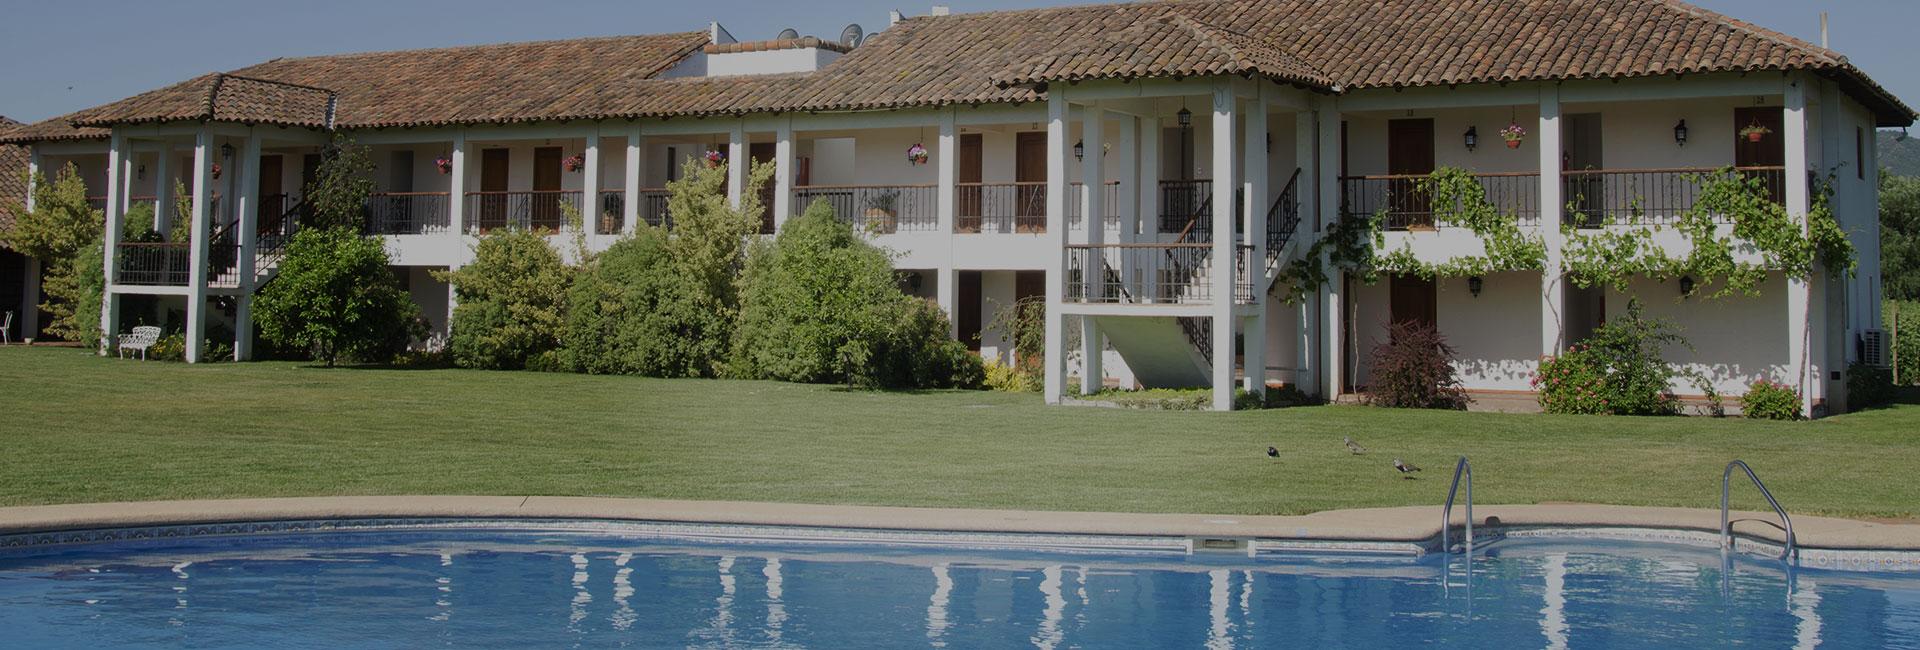 Hotel Terra Vina Pool Area